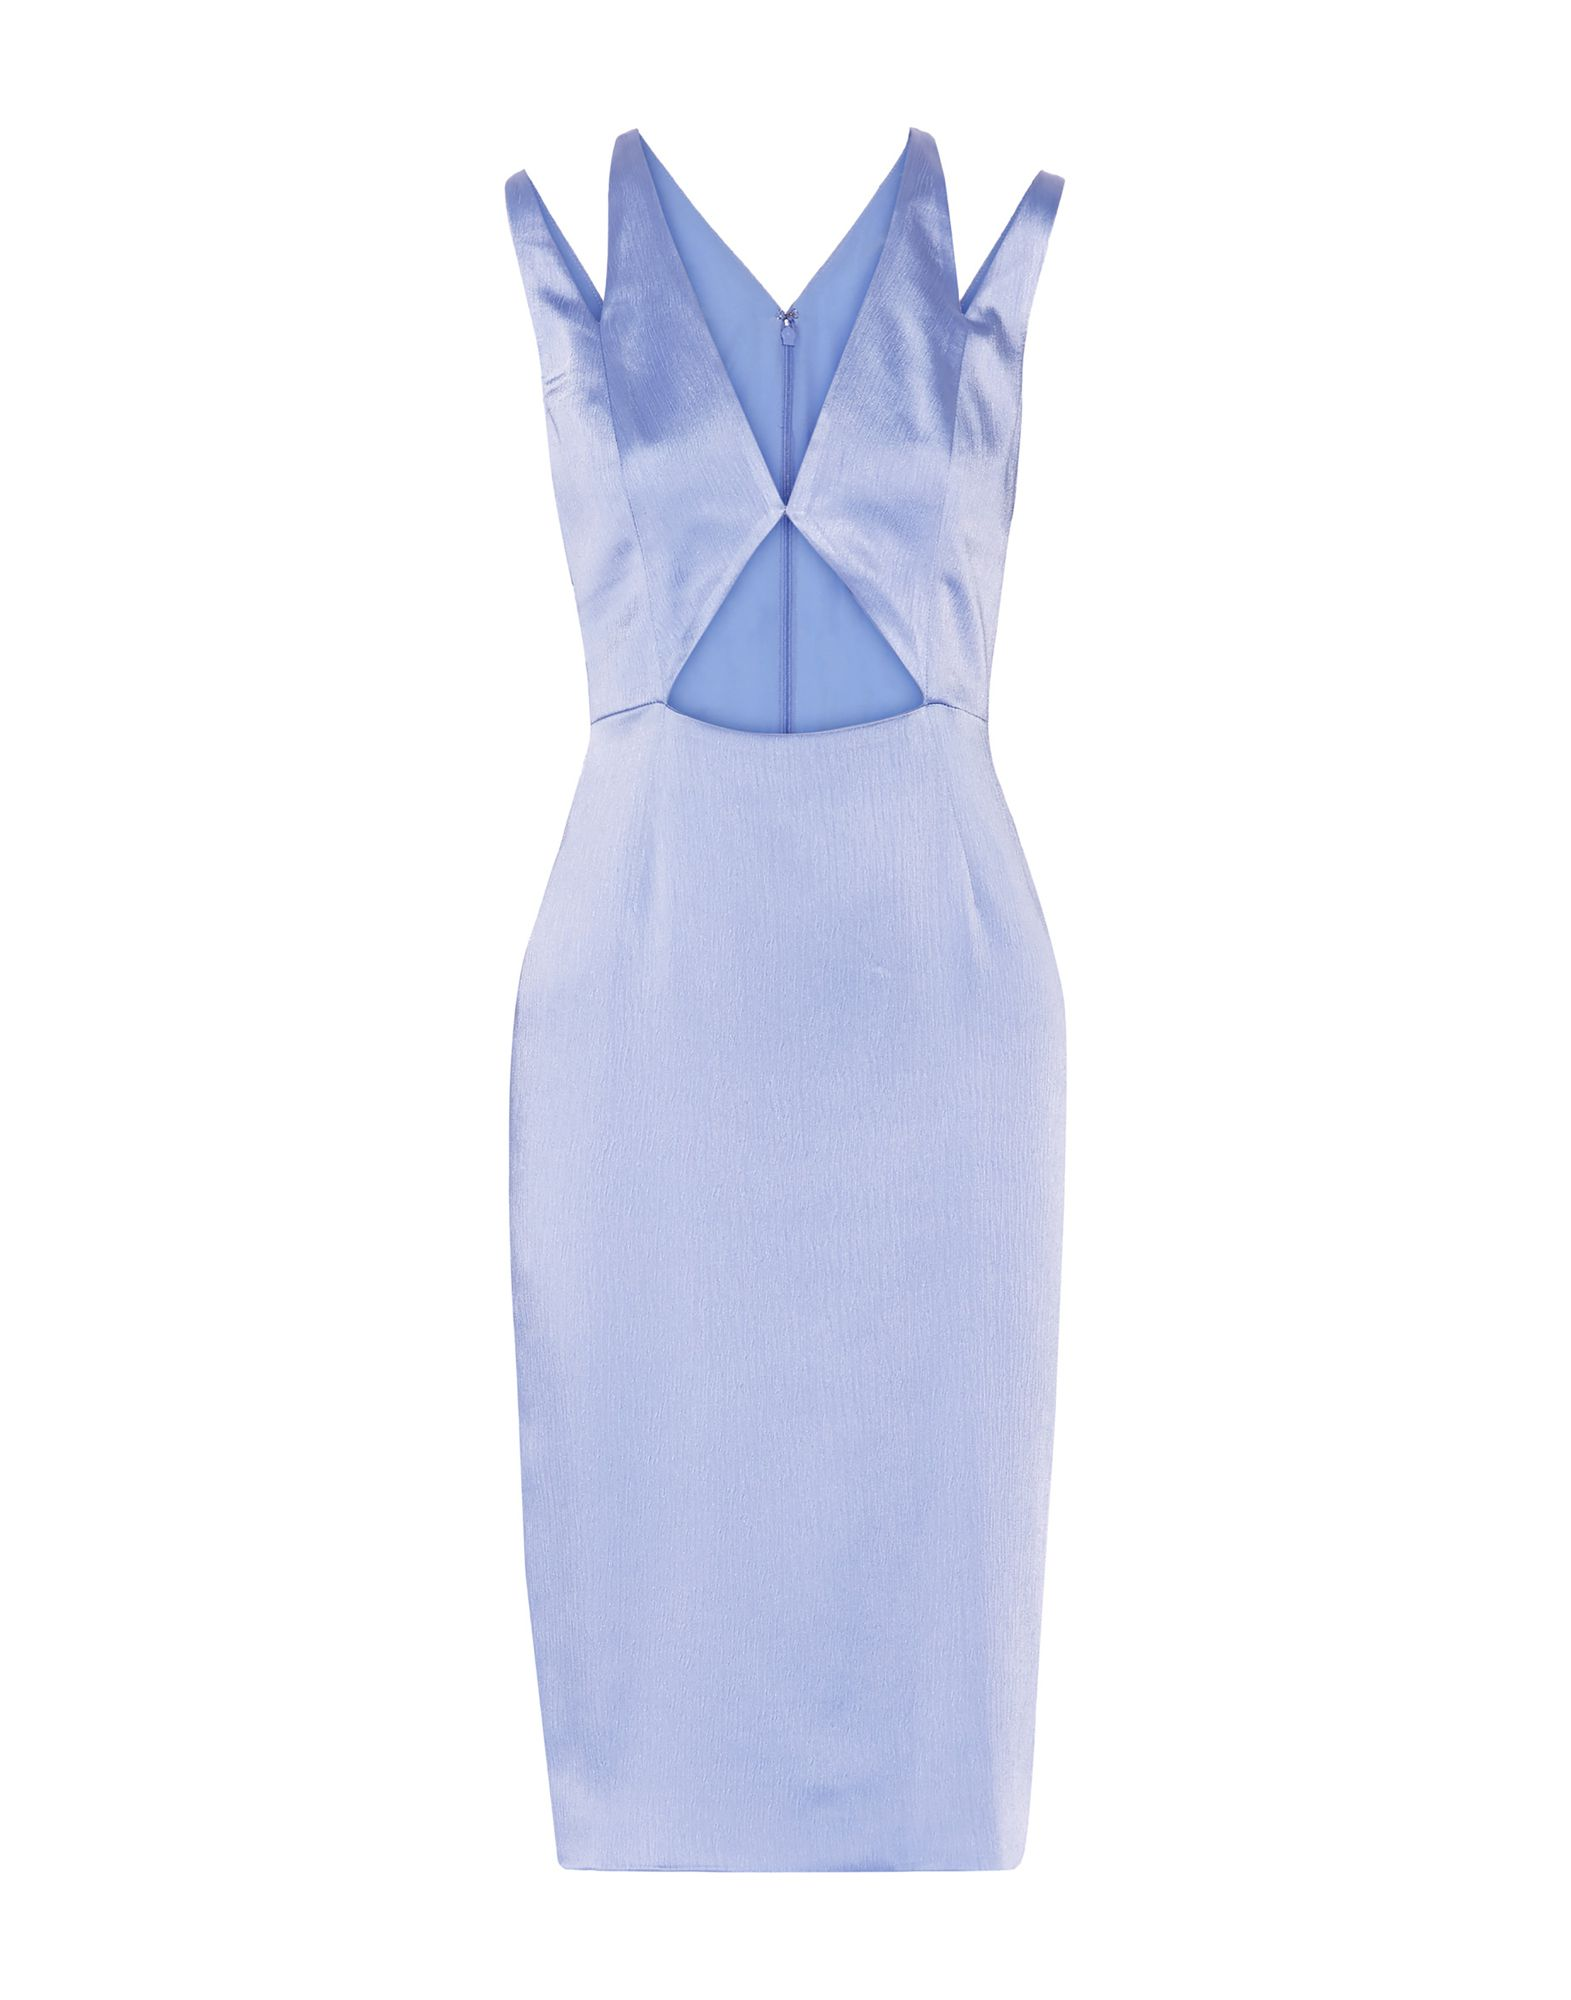 Vestito Vestito Al Ginoc o Cushnie donna - 34891796RQ  faire Preise